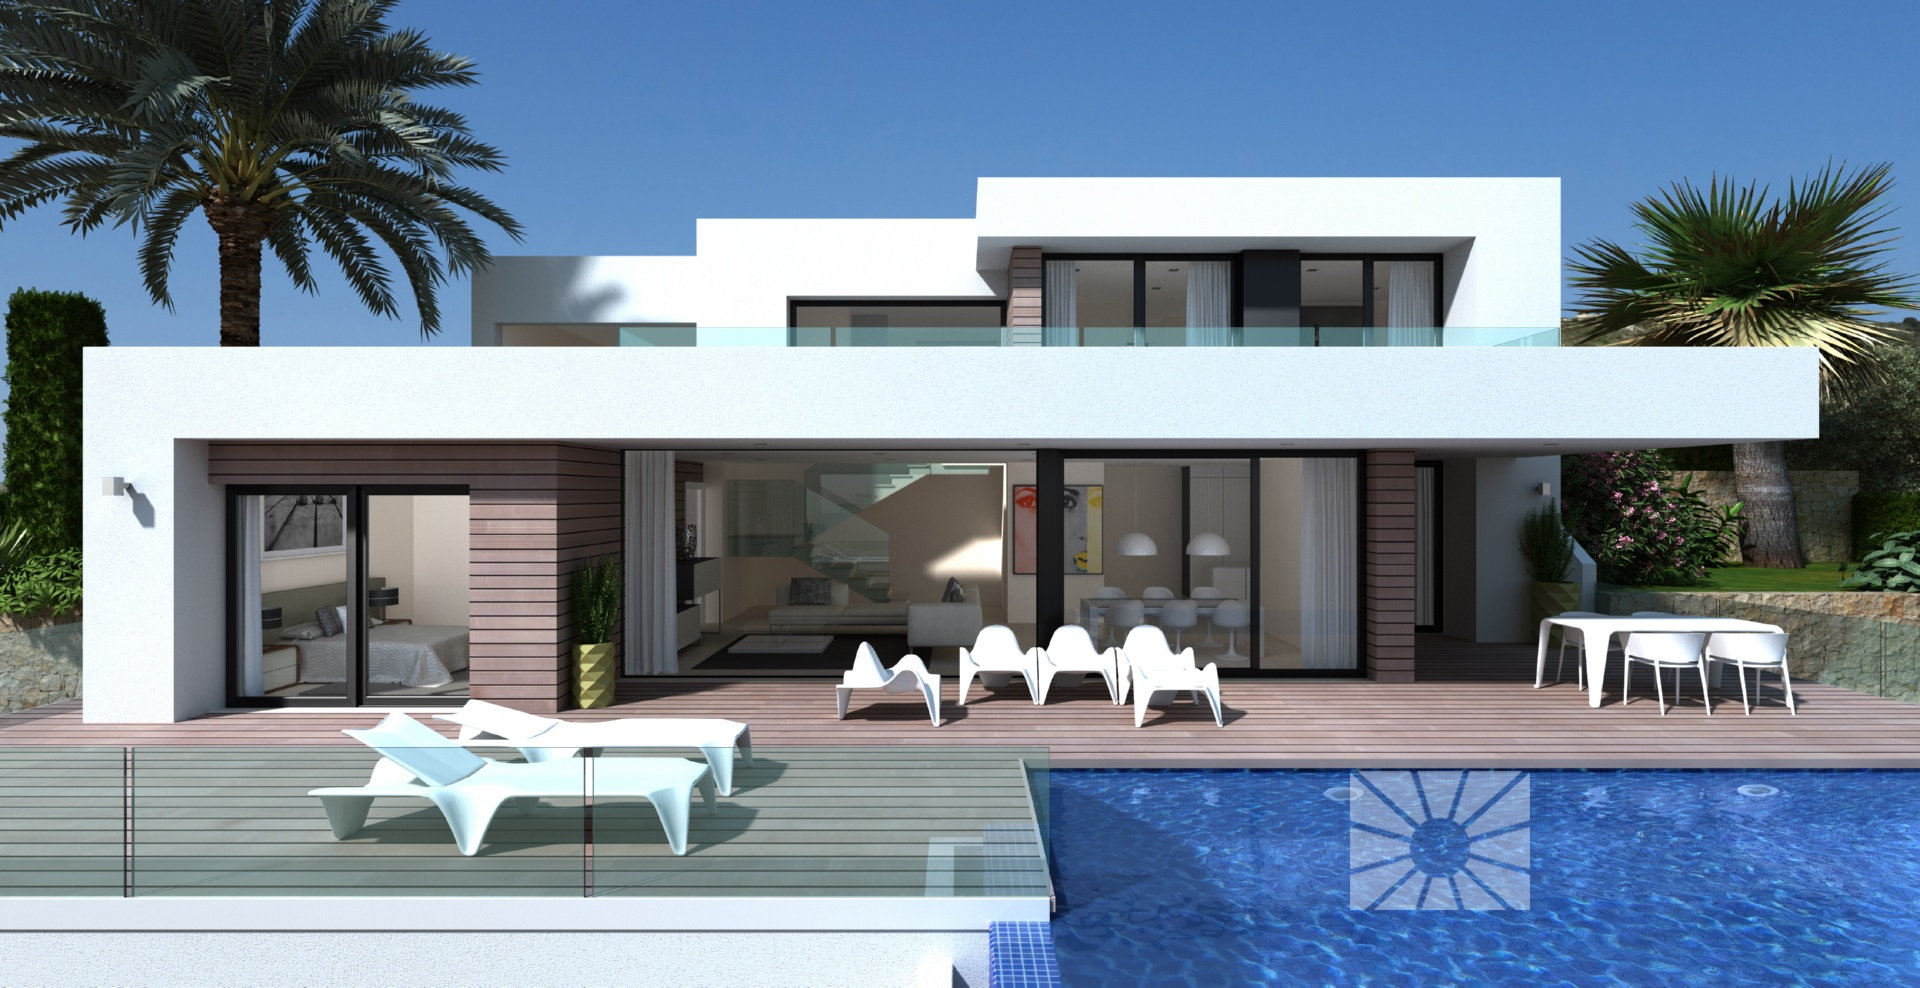 marketing exterior personalizada no_procede pe019 villa bahia - Chalets Modernos